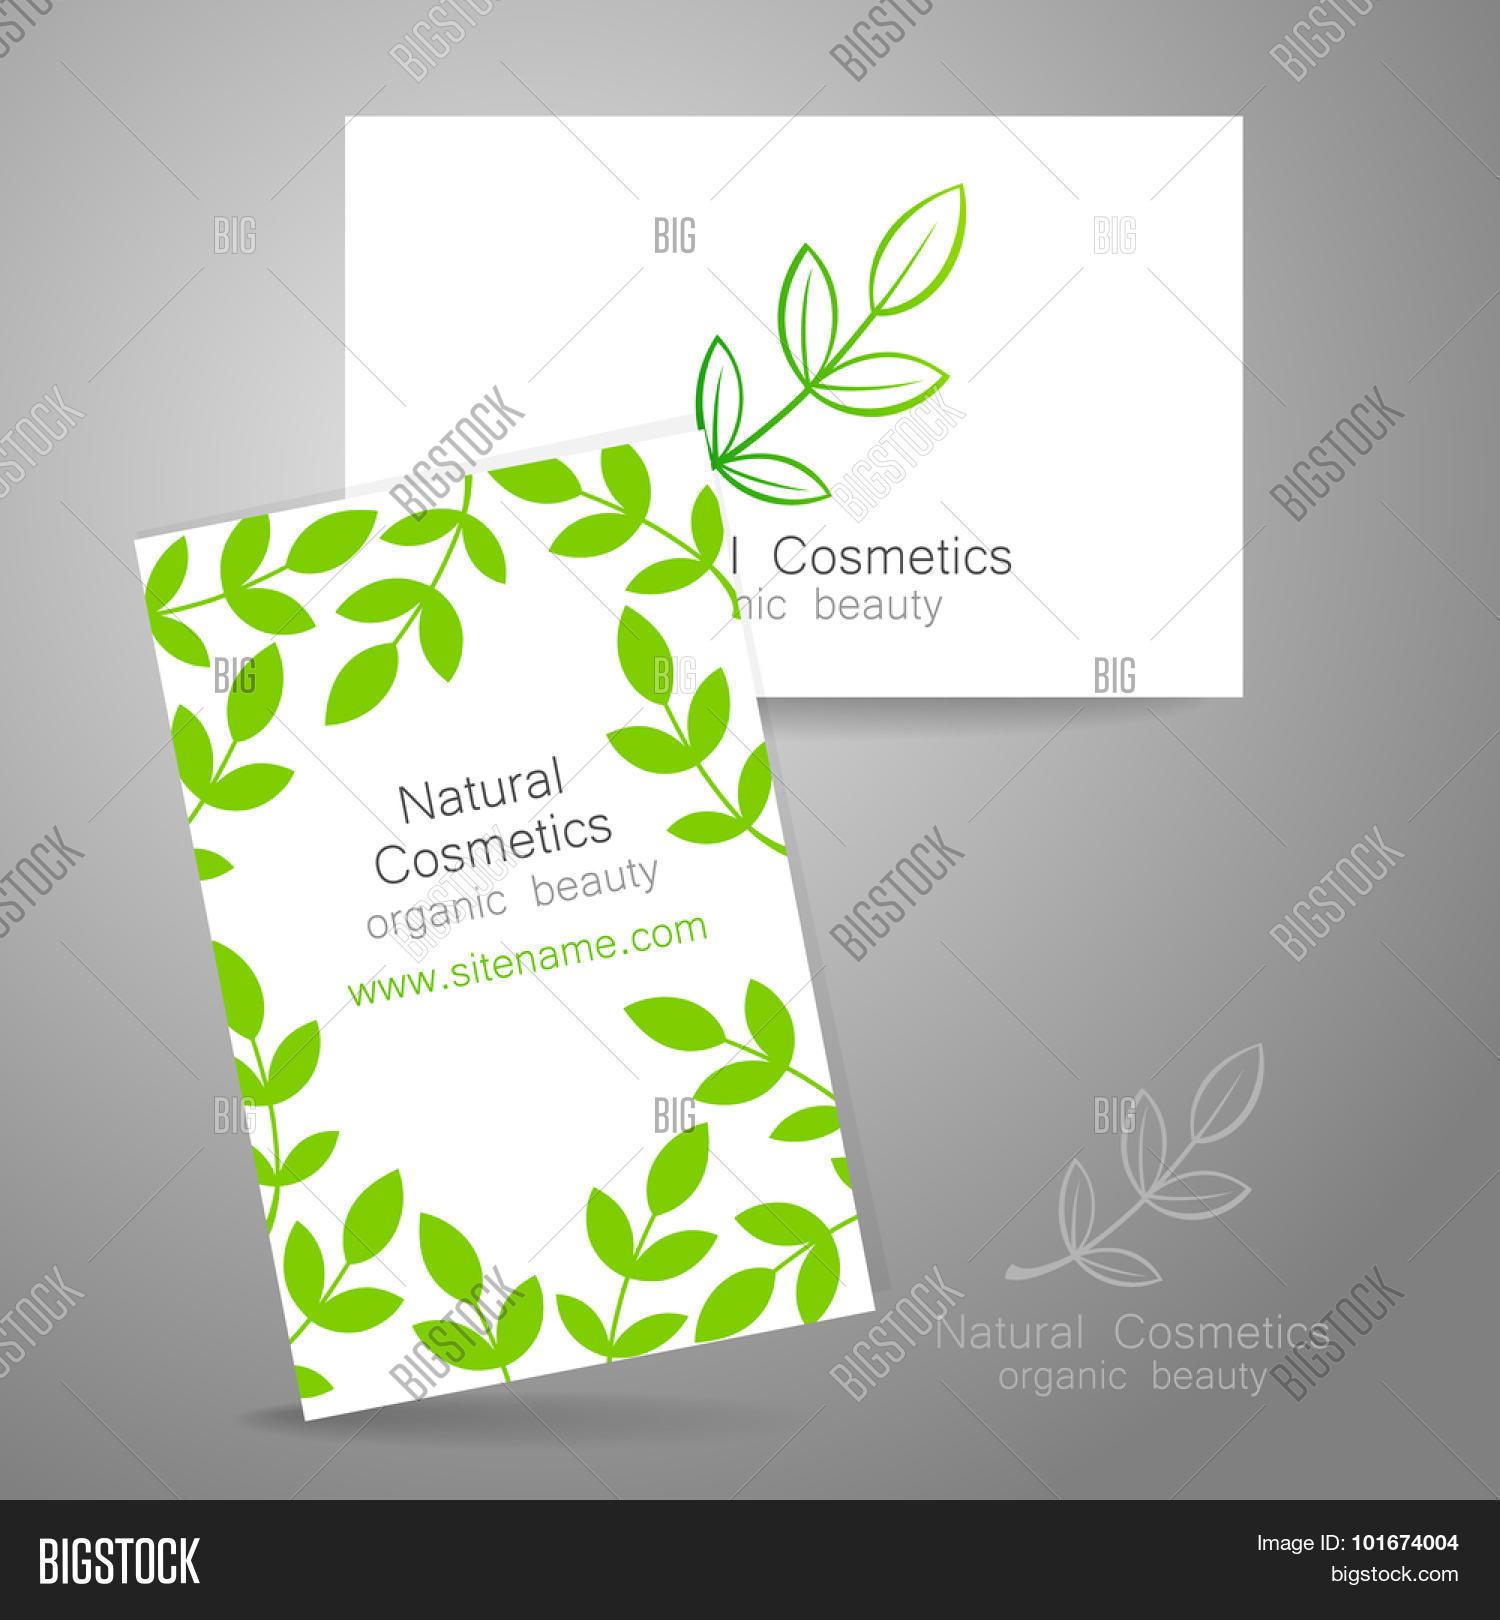 Natural Cosmetics Vector & Photo (Free Trial) | Bigstock